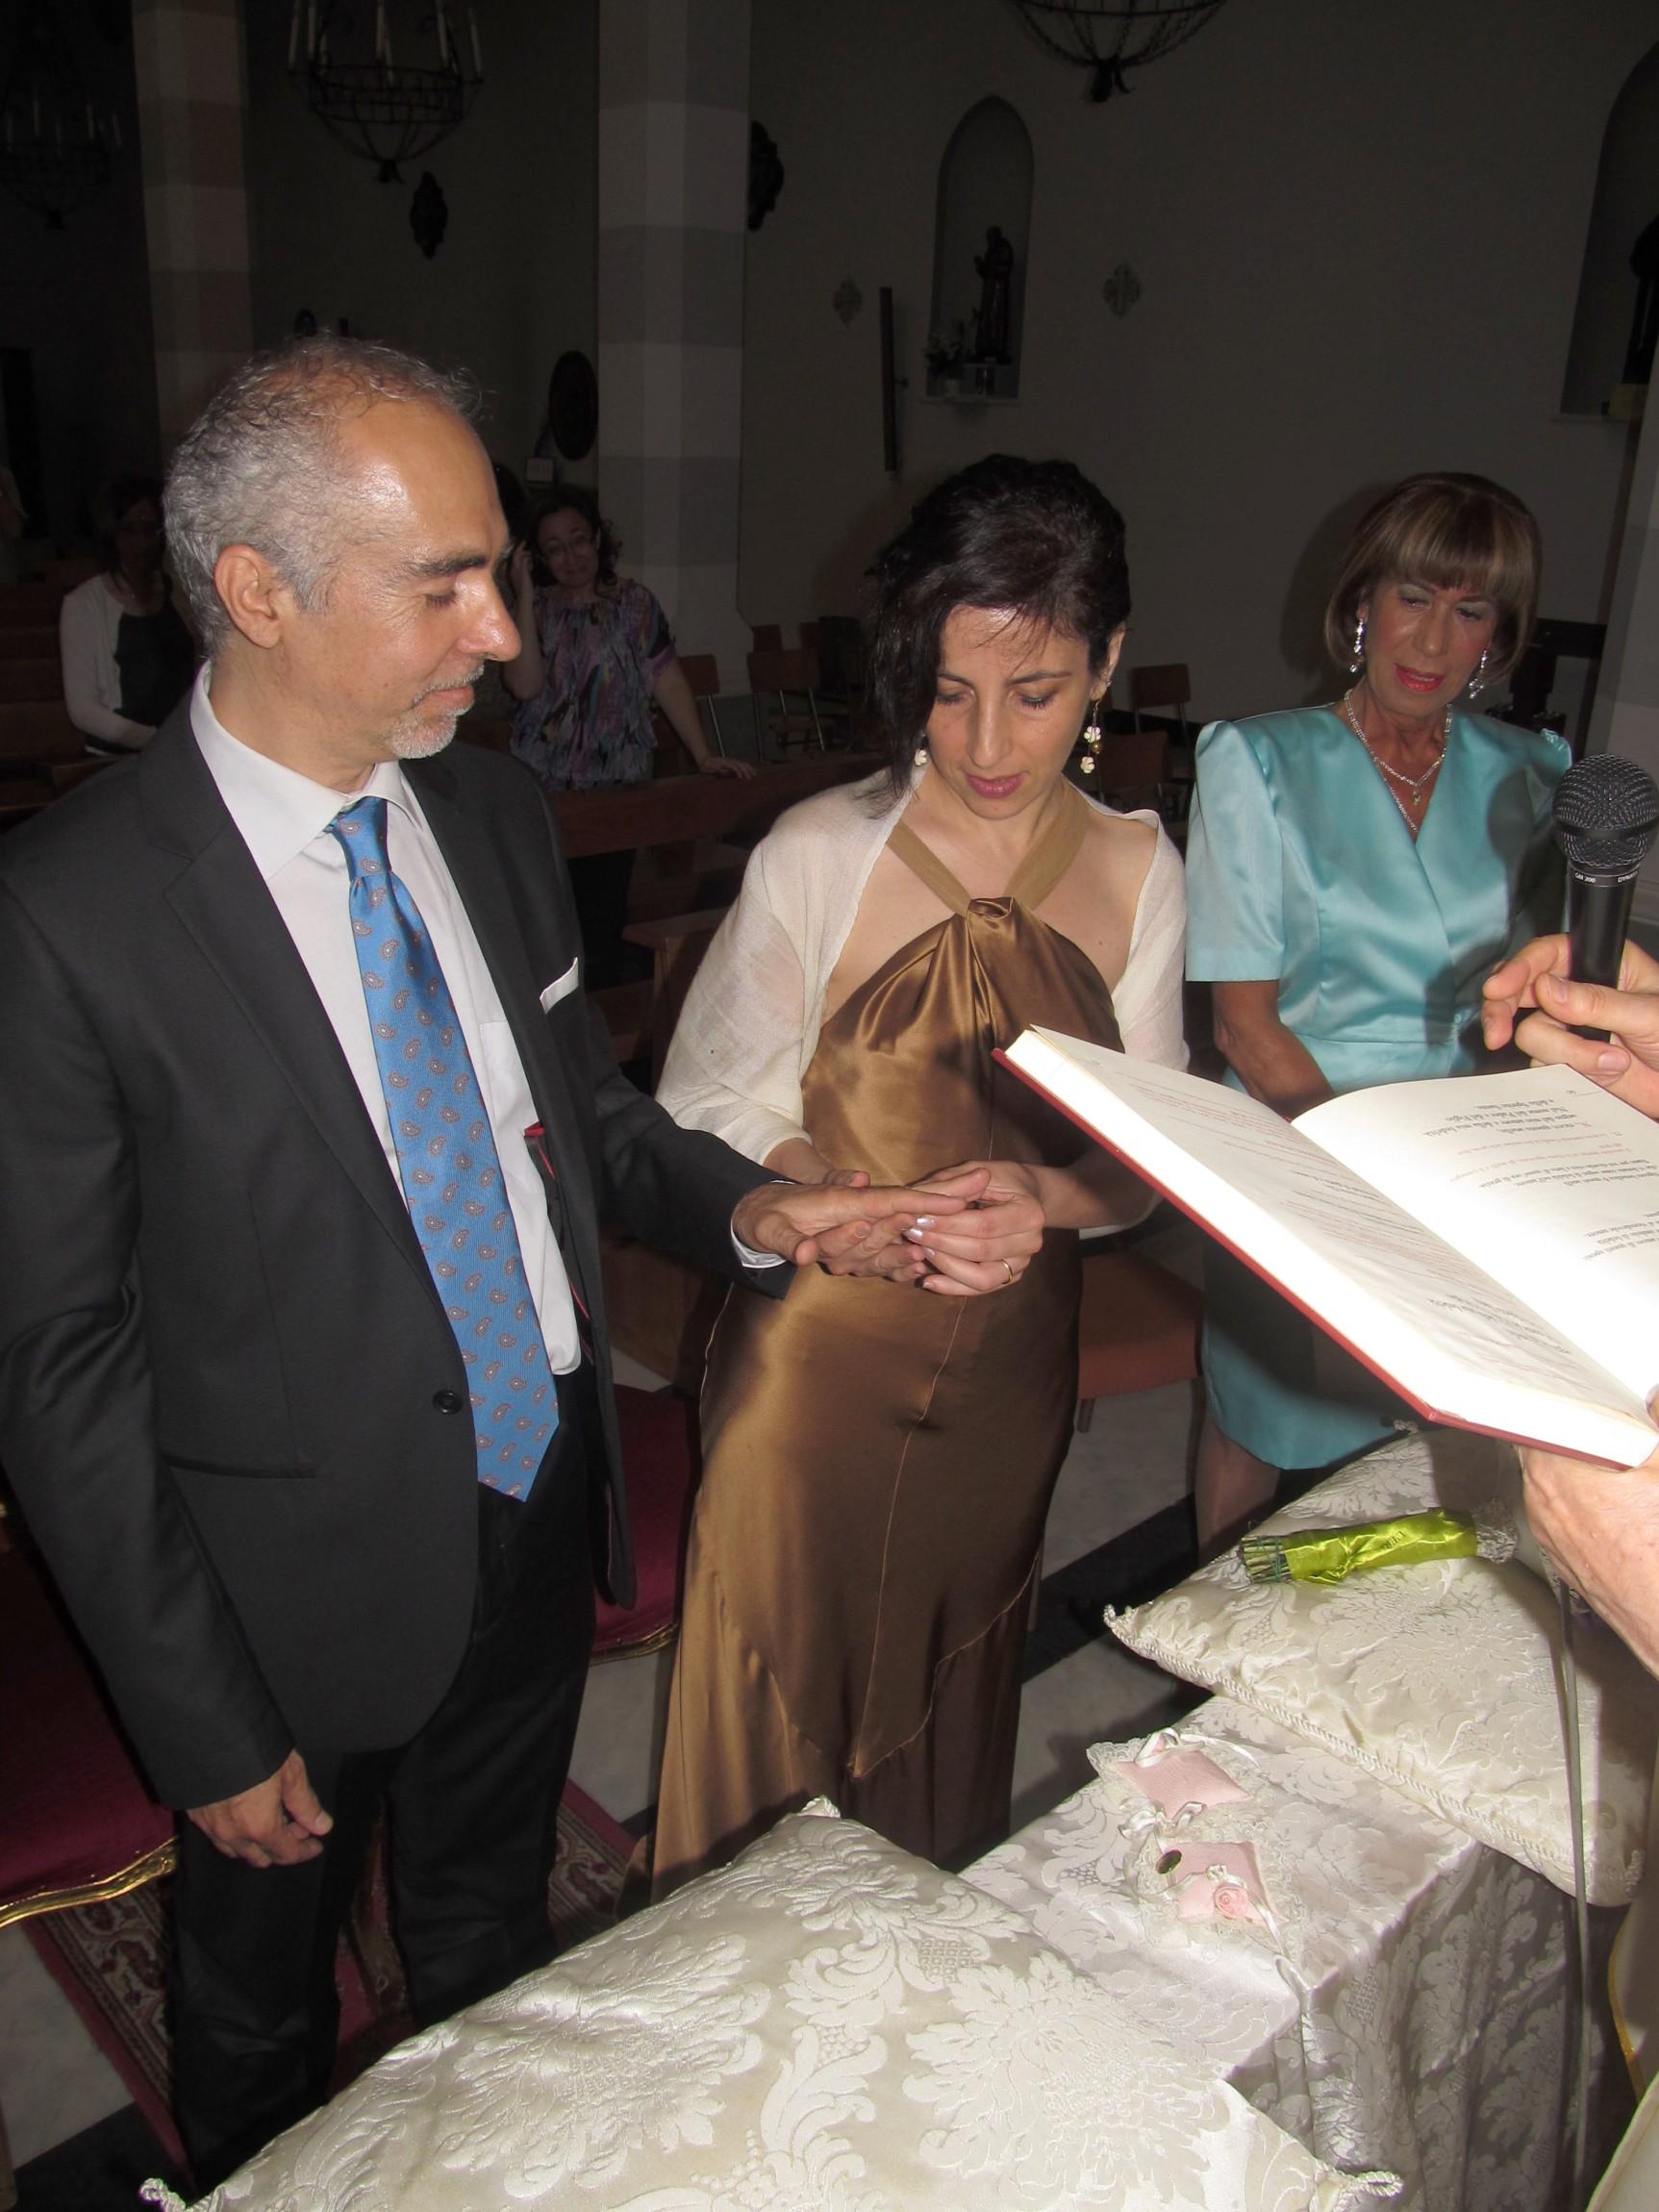 matrimonio_e_battesimo_piras_marsala_2014-06-28-16-07-06